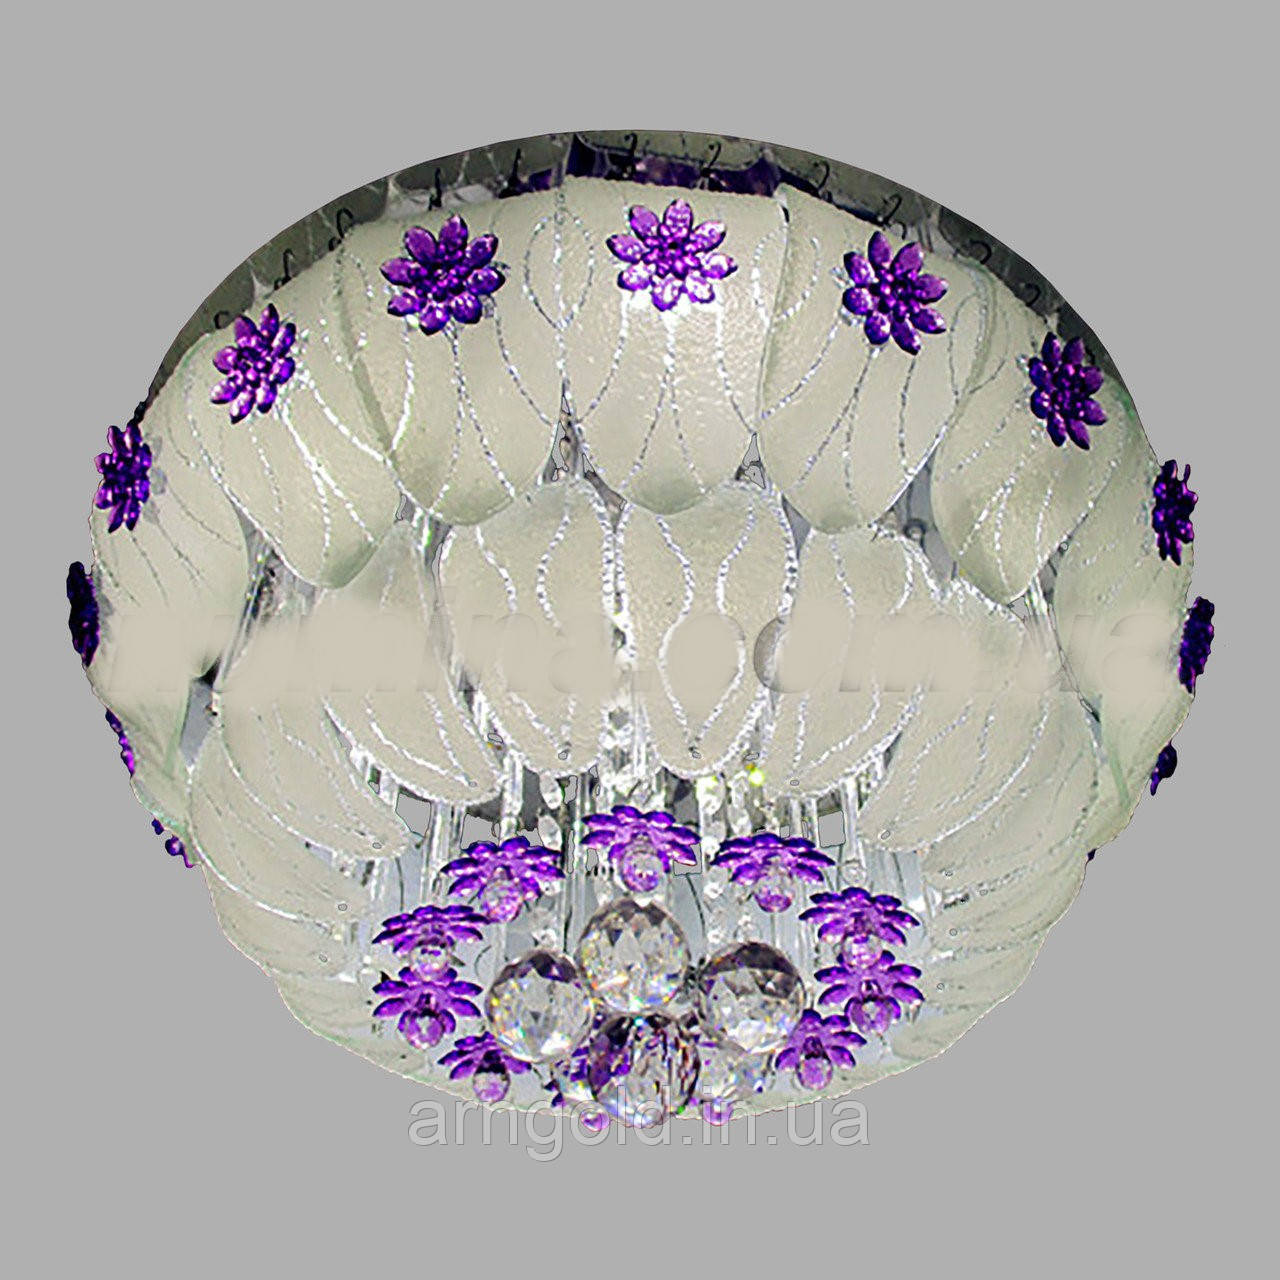 Люстра потолочная торт-LED 5567/500 RGB+E14+пульт